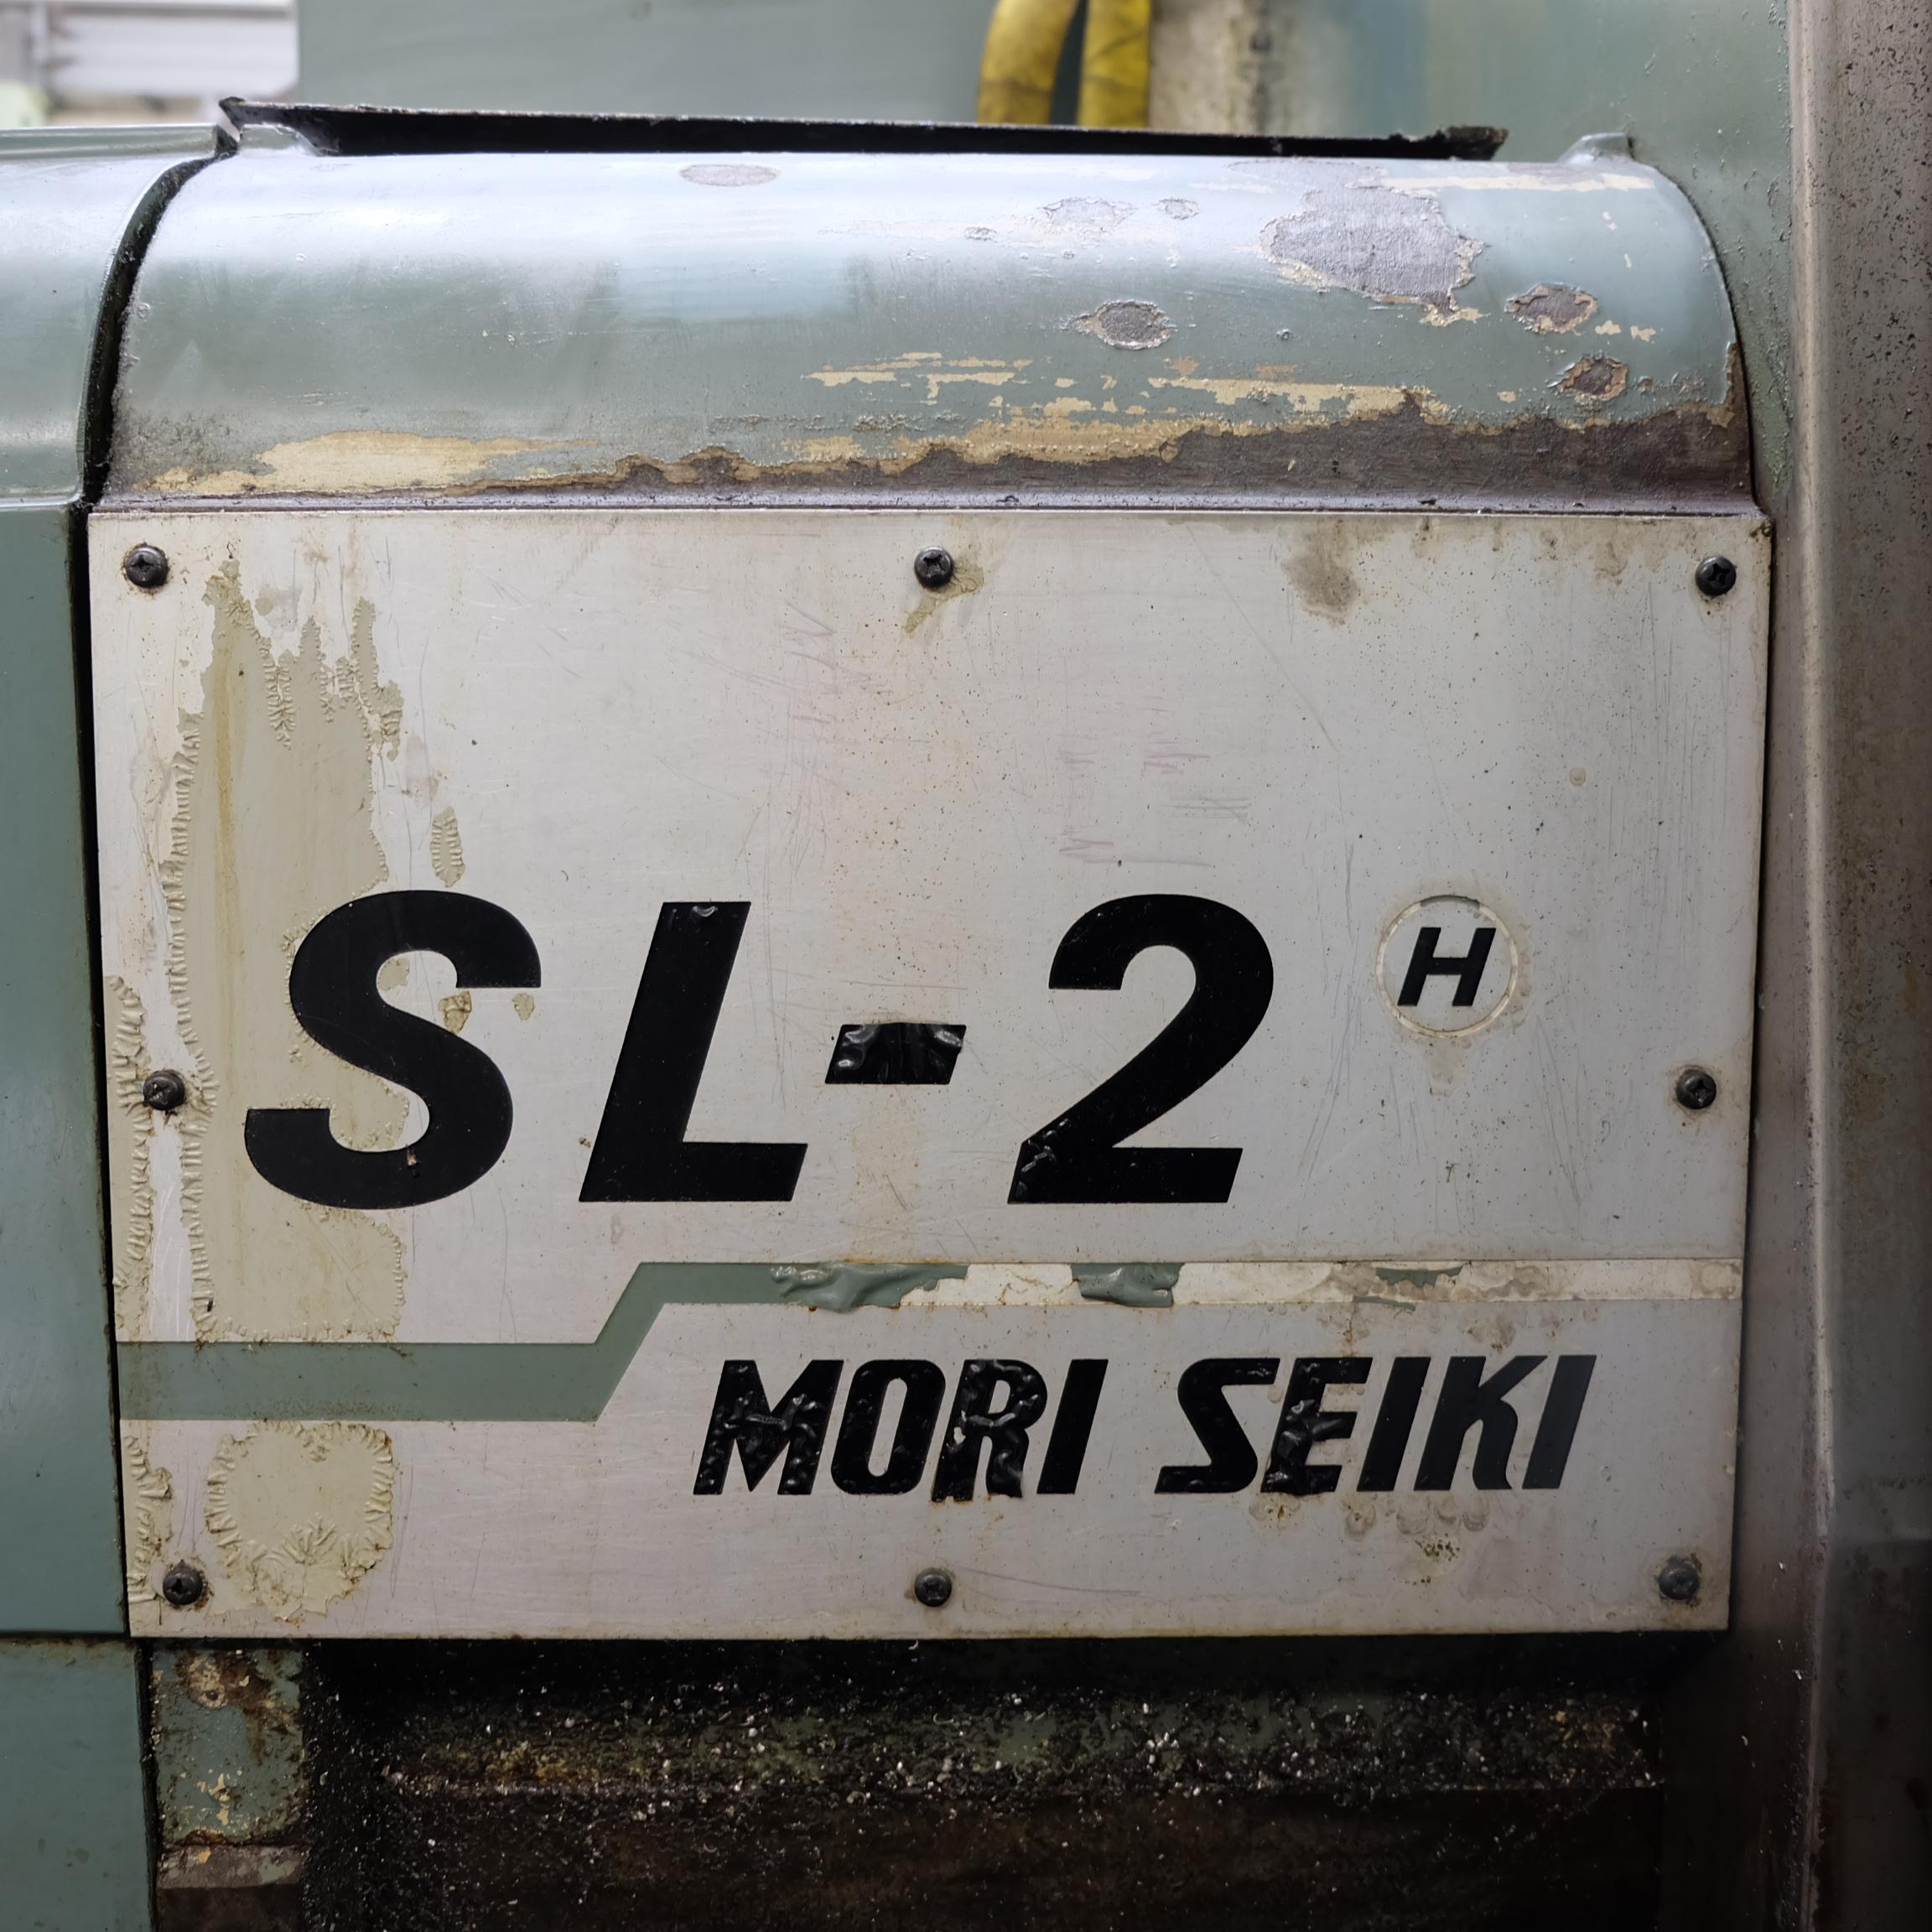 Mori Seiki SL-2H CNC Turning Lathe With Fanuc 11T Control. - Image 16 of 17